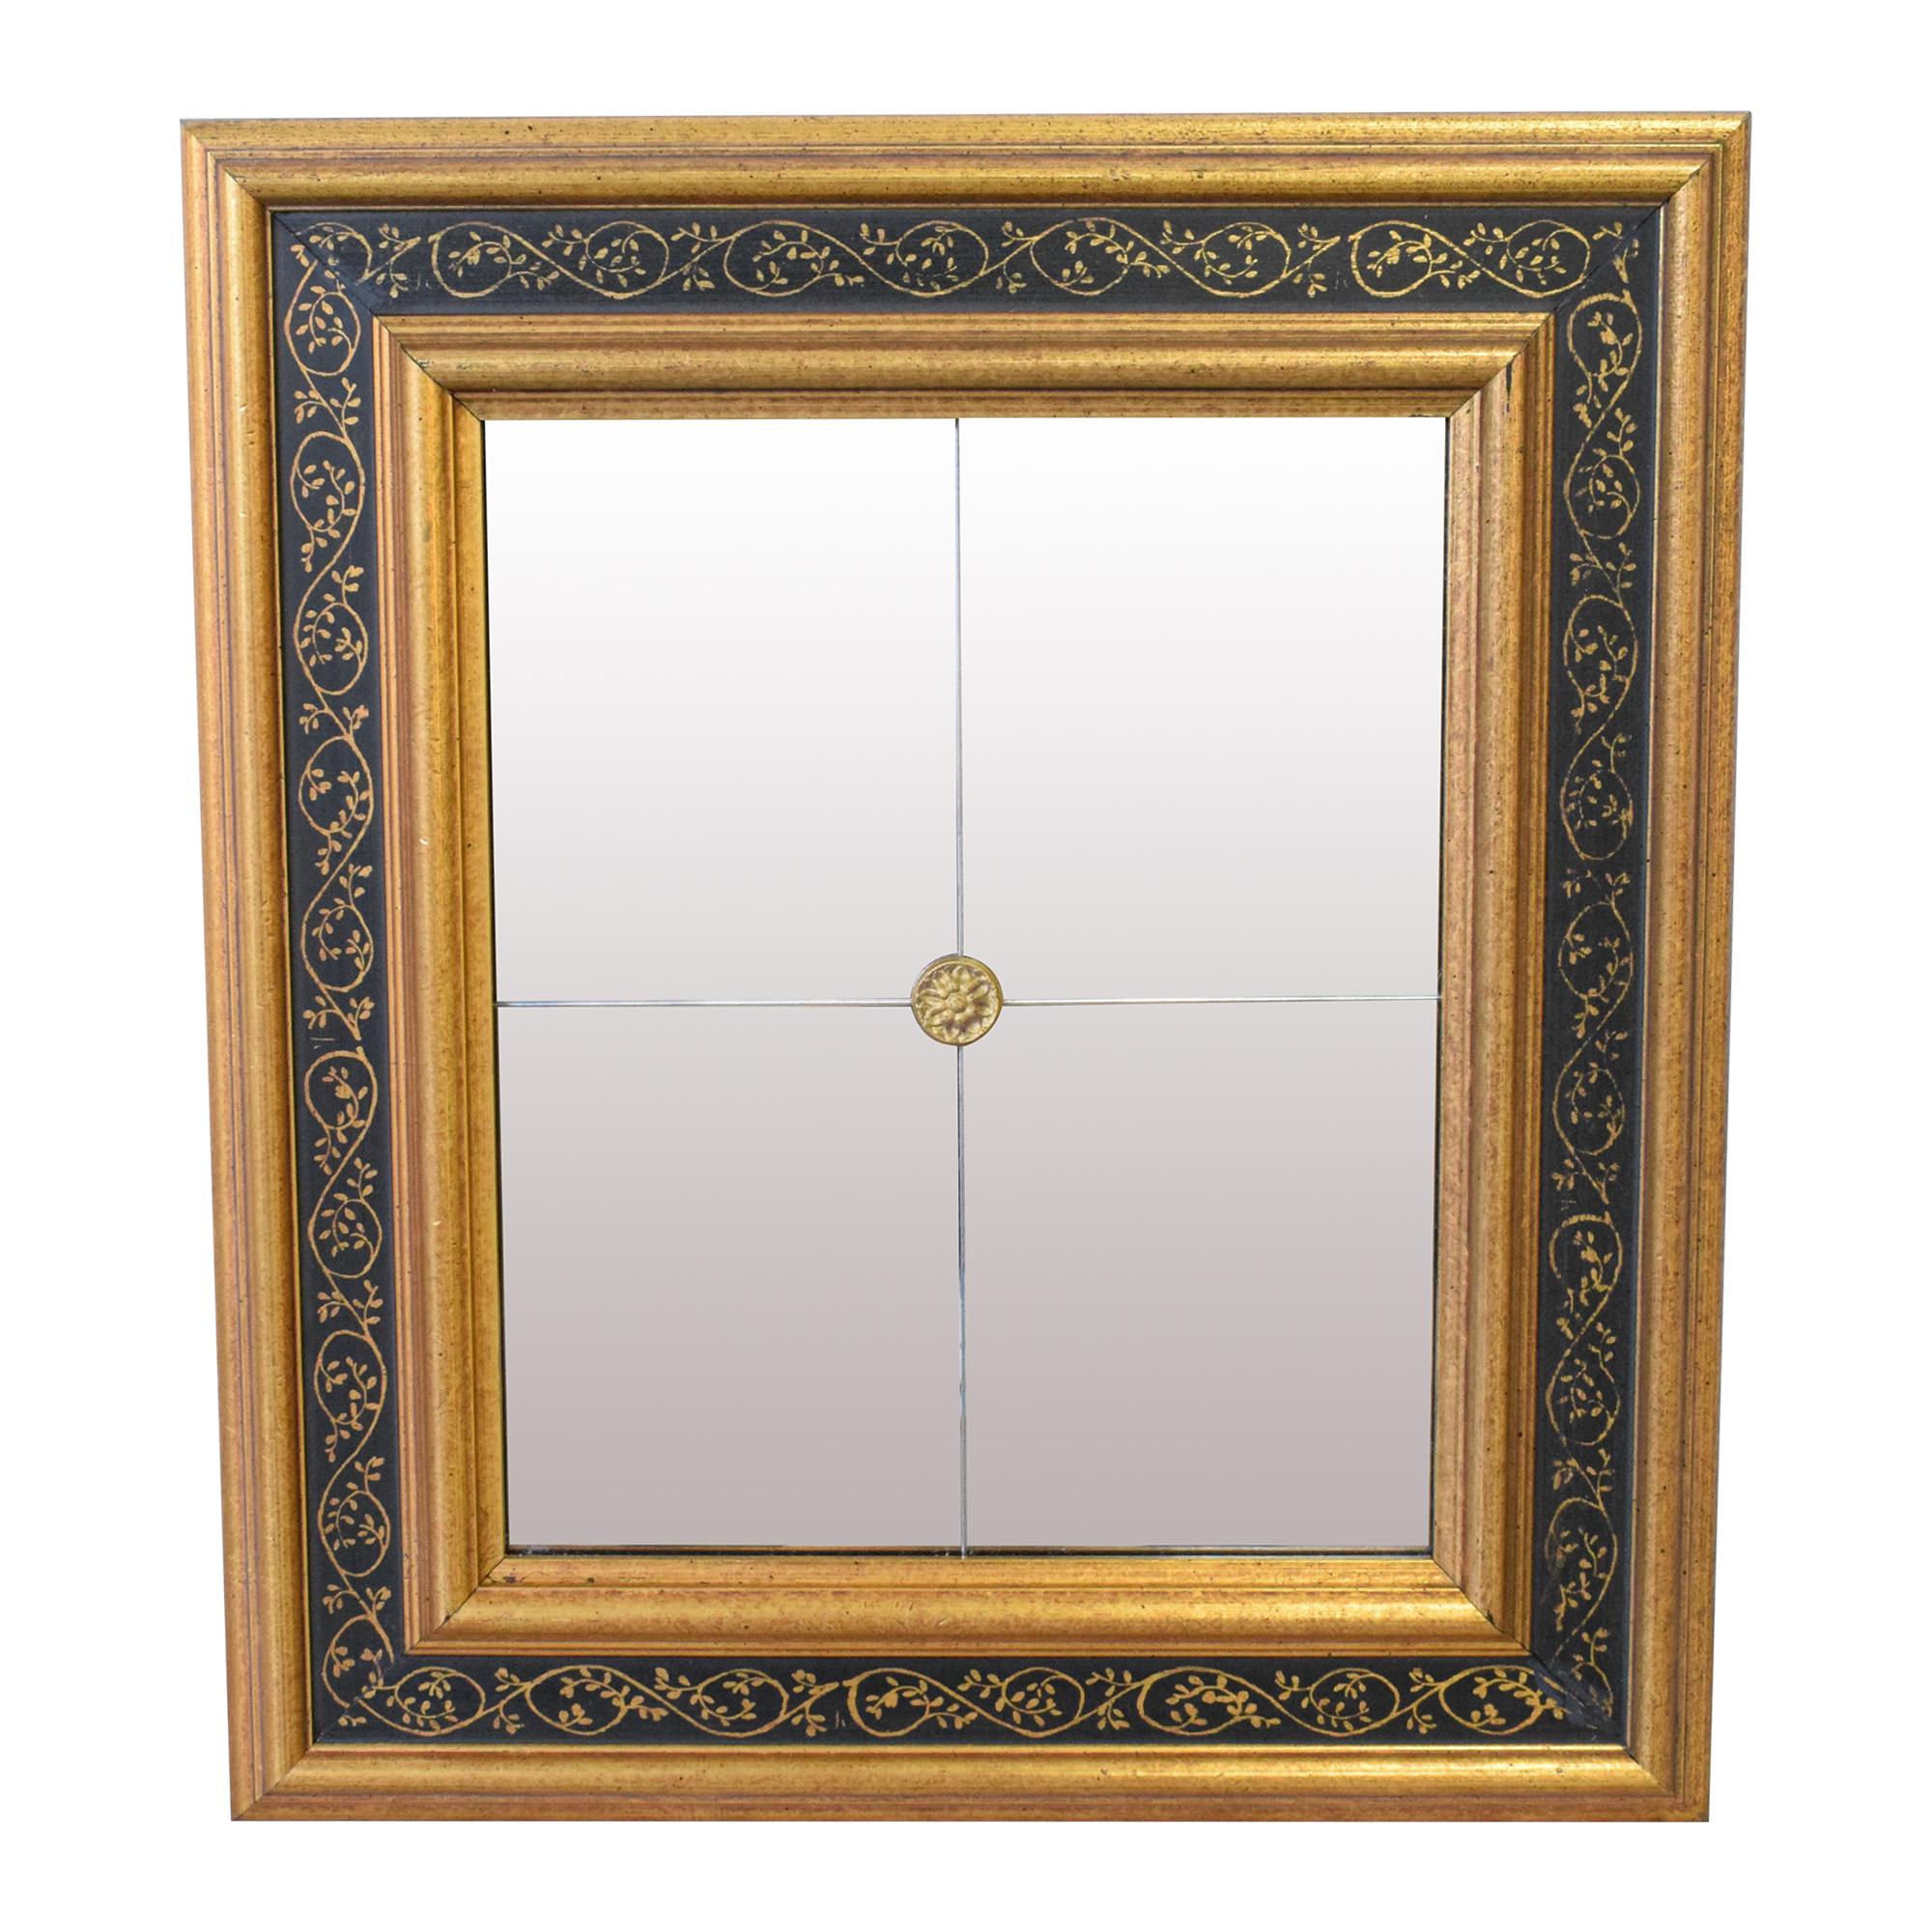 Ethan Allen Ethan Allen Rosette Mini Mirror on sale